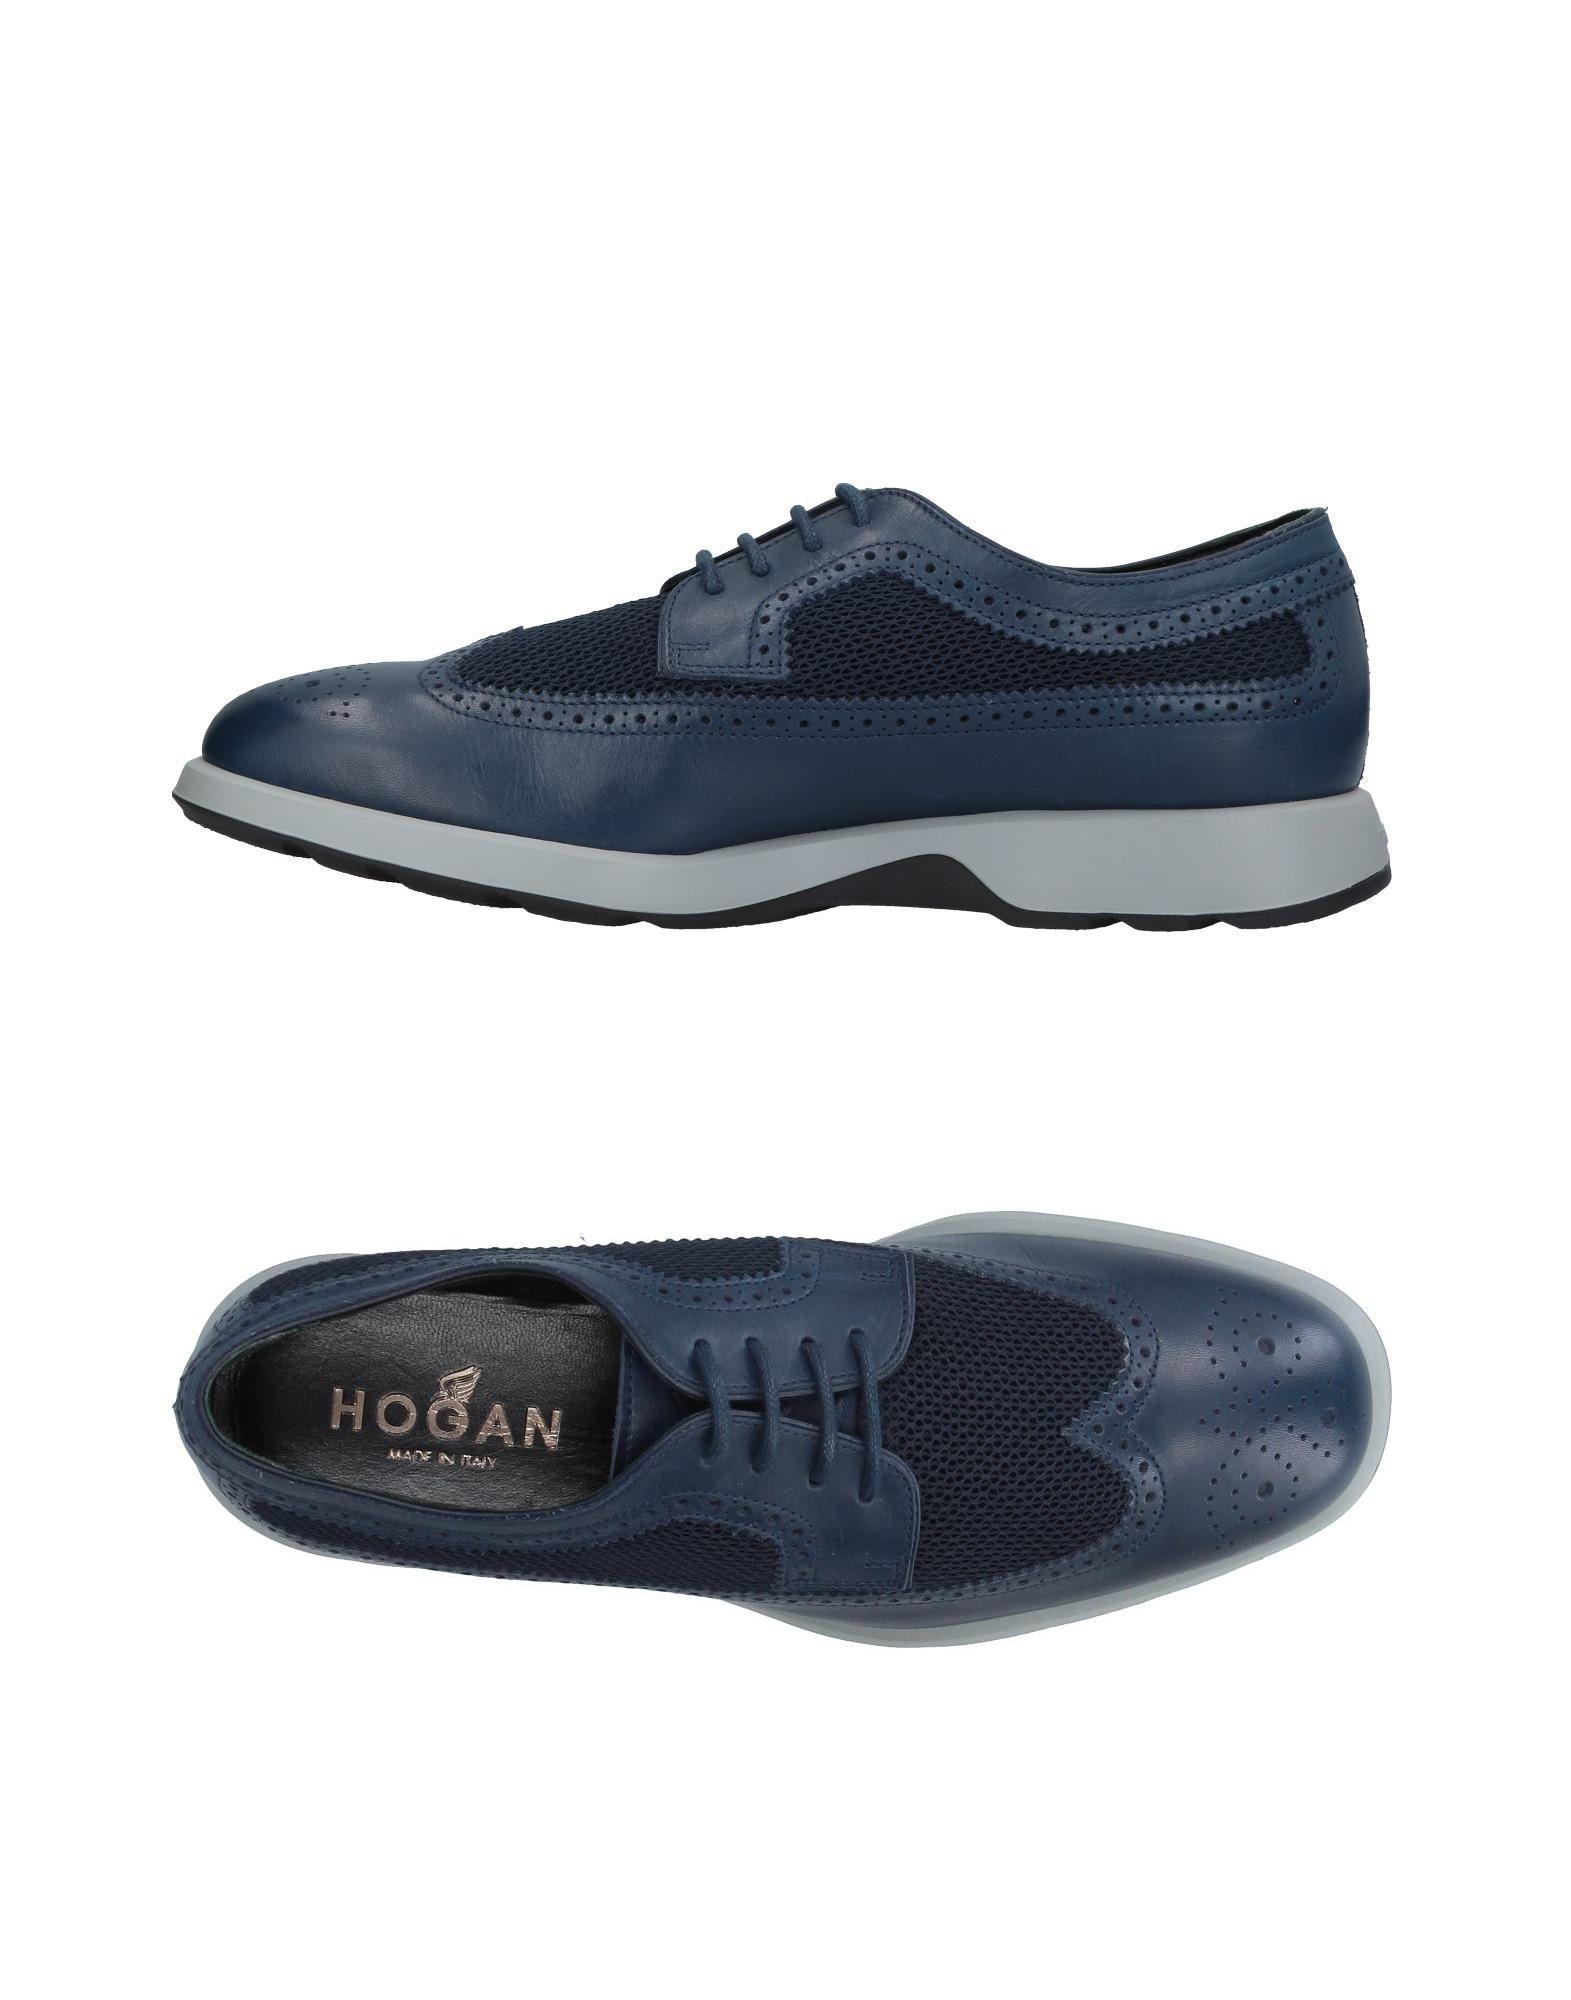 Hogan Laced Shoes In Dark Blue